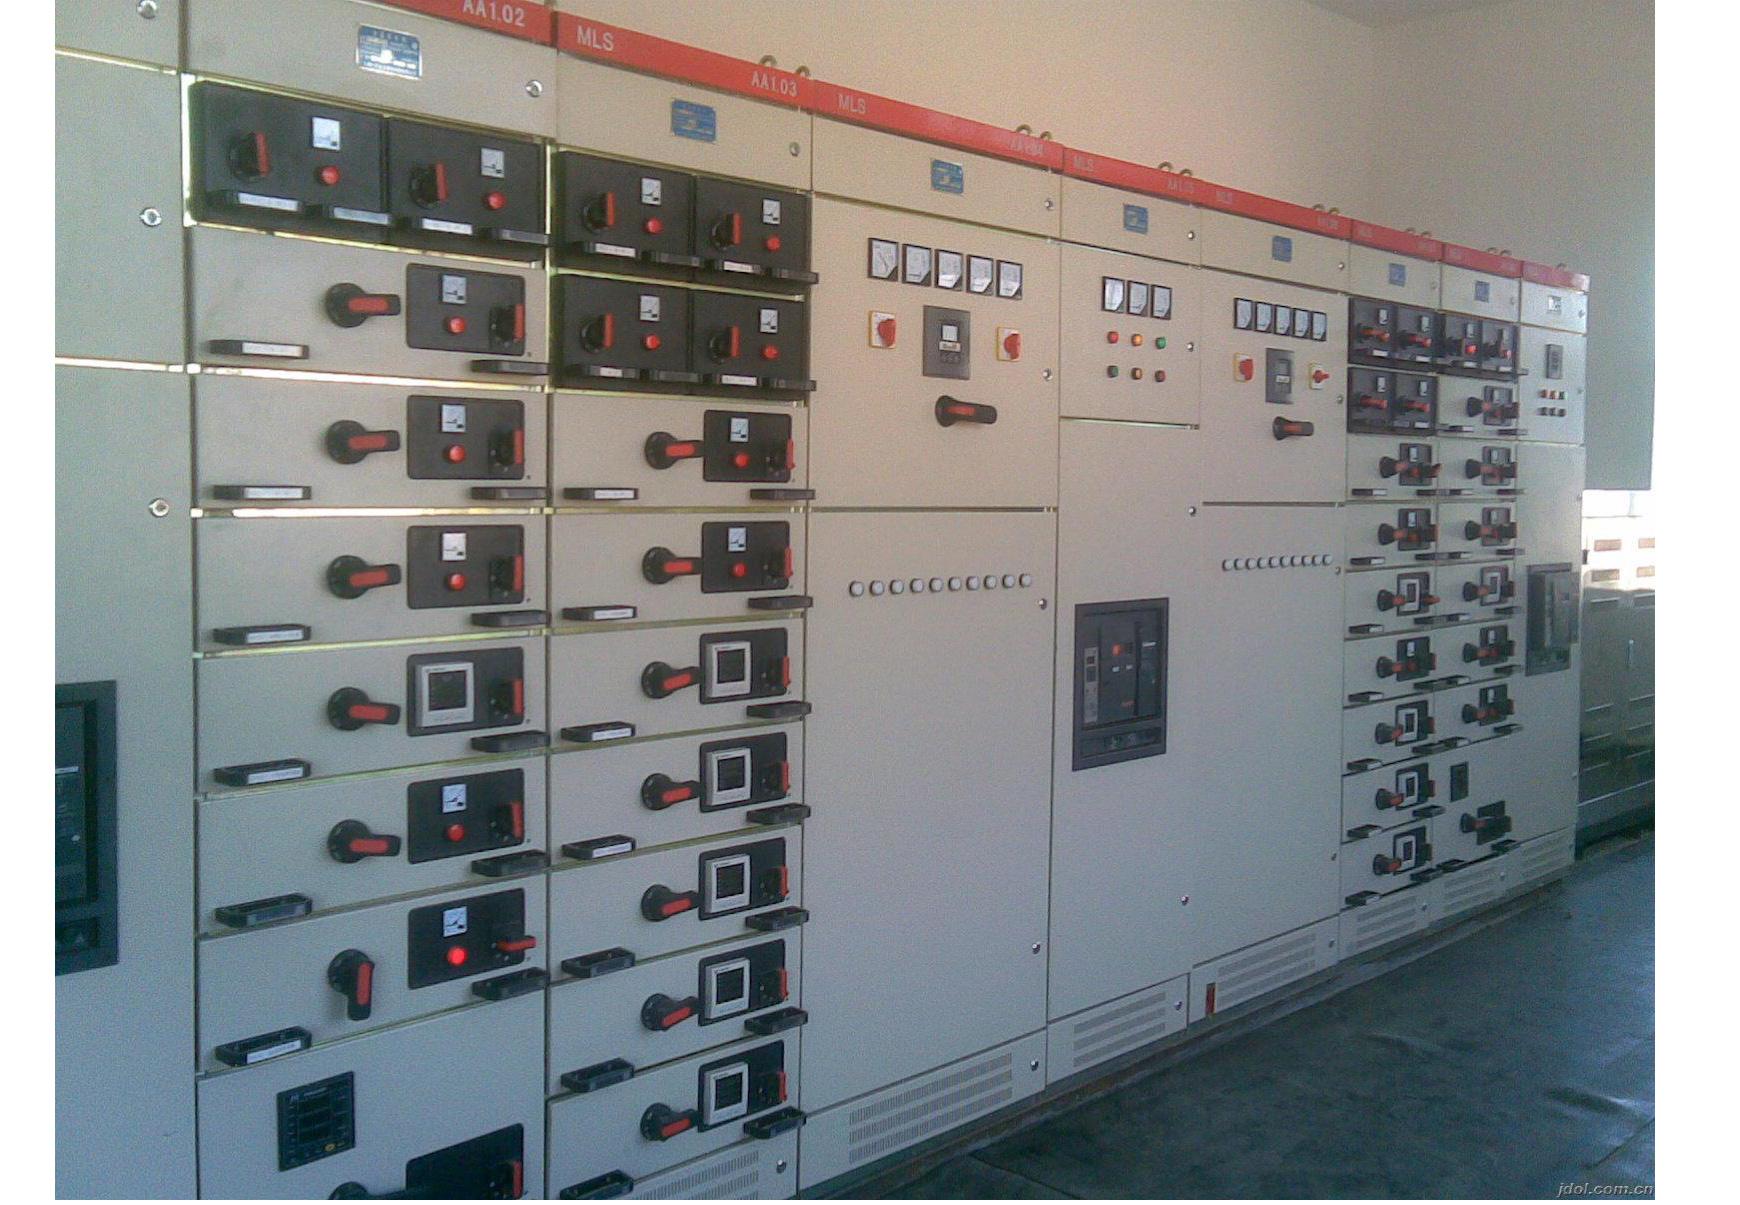 MNS型低压抽屉式开关柜概述: MNS型低压抽屉式开关柜是为满足不断发展的电力市场对增容、计算机接口、动力集中控制、方便安装维修、缩短事故处理时间等需要,参考ABB产品技术设计制造国产化的系列产品。装置适用于发电厂、石油、化工、纺织、高层建筑等行业的配电系统、变电所。在大型发电厂、石化系统等自动化程度高,要求与计算机接口的场所,作为三相交流、频率为50(60)Hz、额定工作电压为380V(400V)、 (660V),额定电流为6300A及以下的发电、供电系统中的配电、电动机集中控制、无功功率补偿等的电